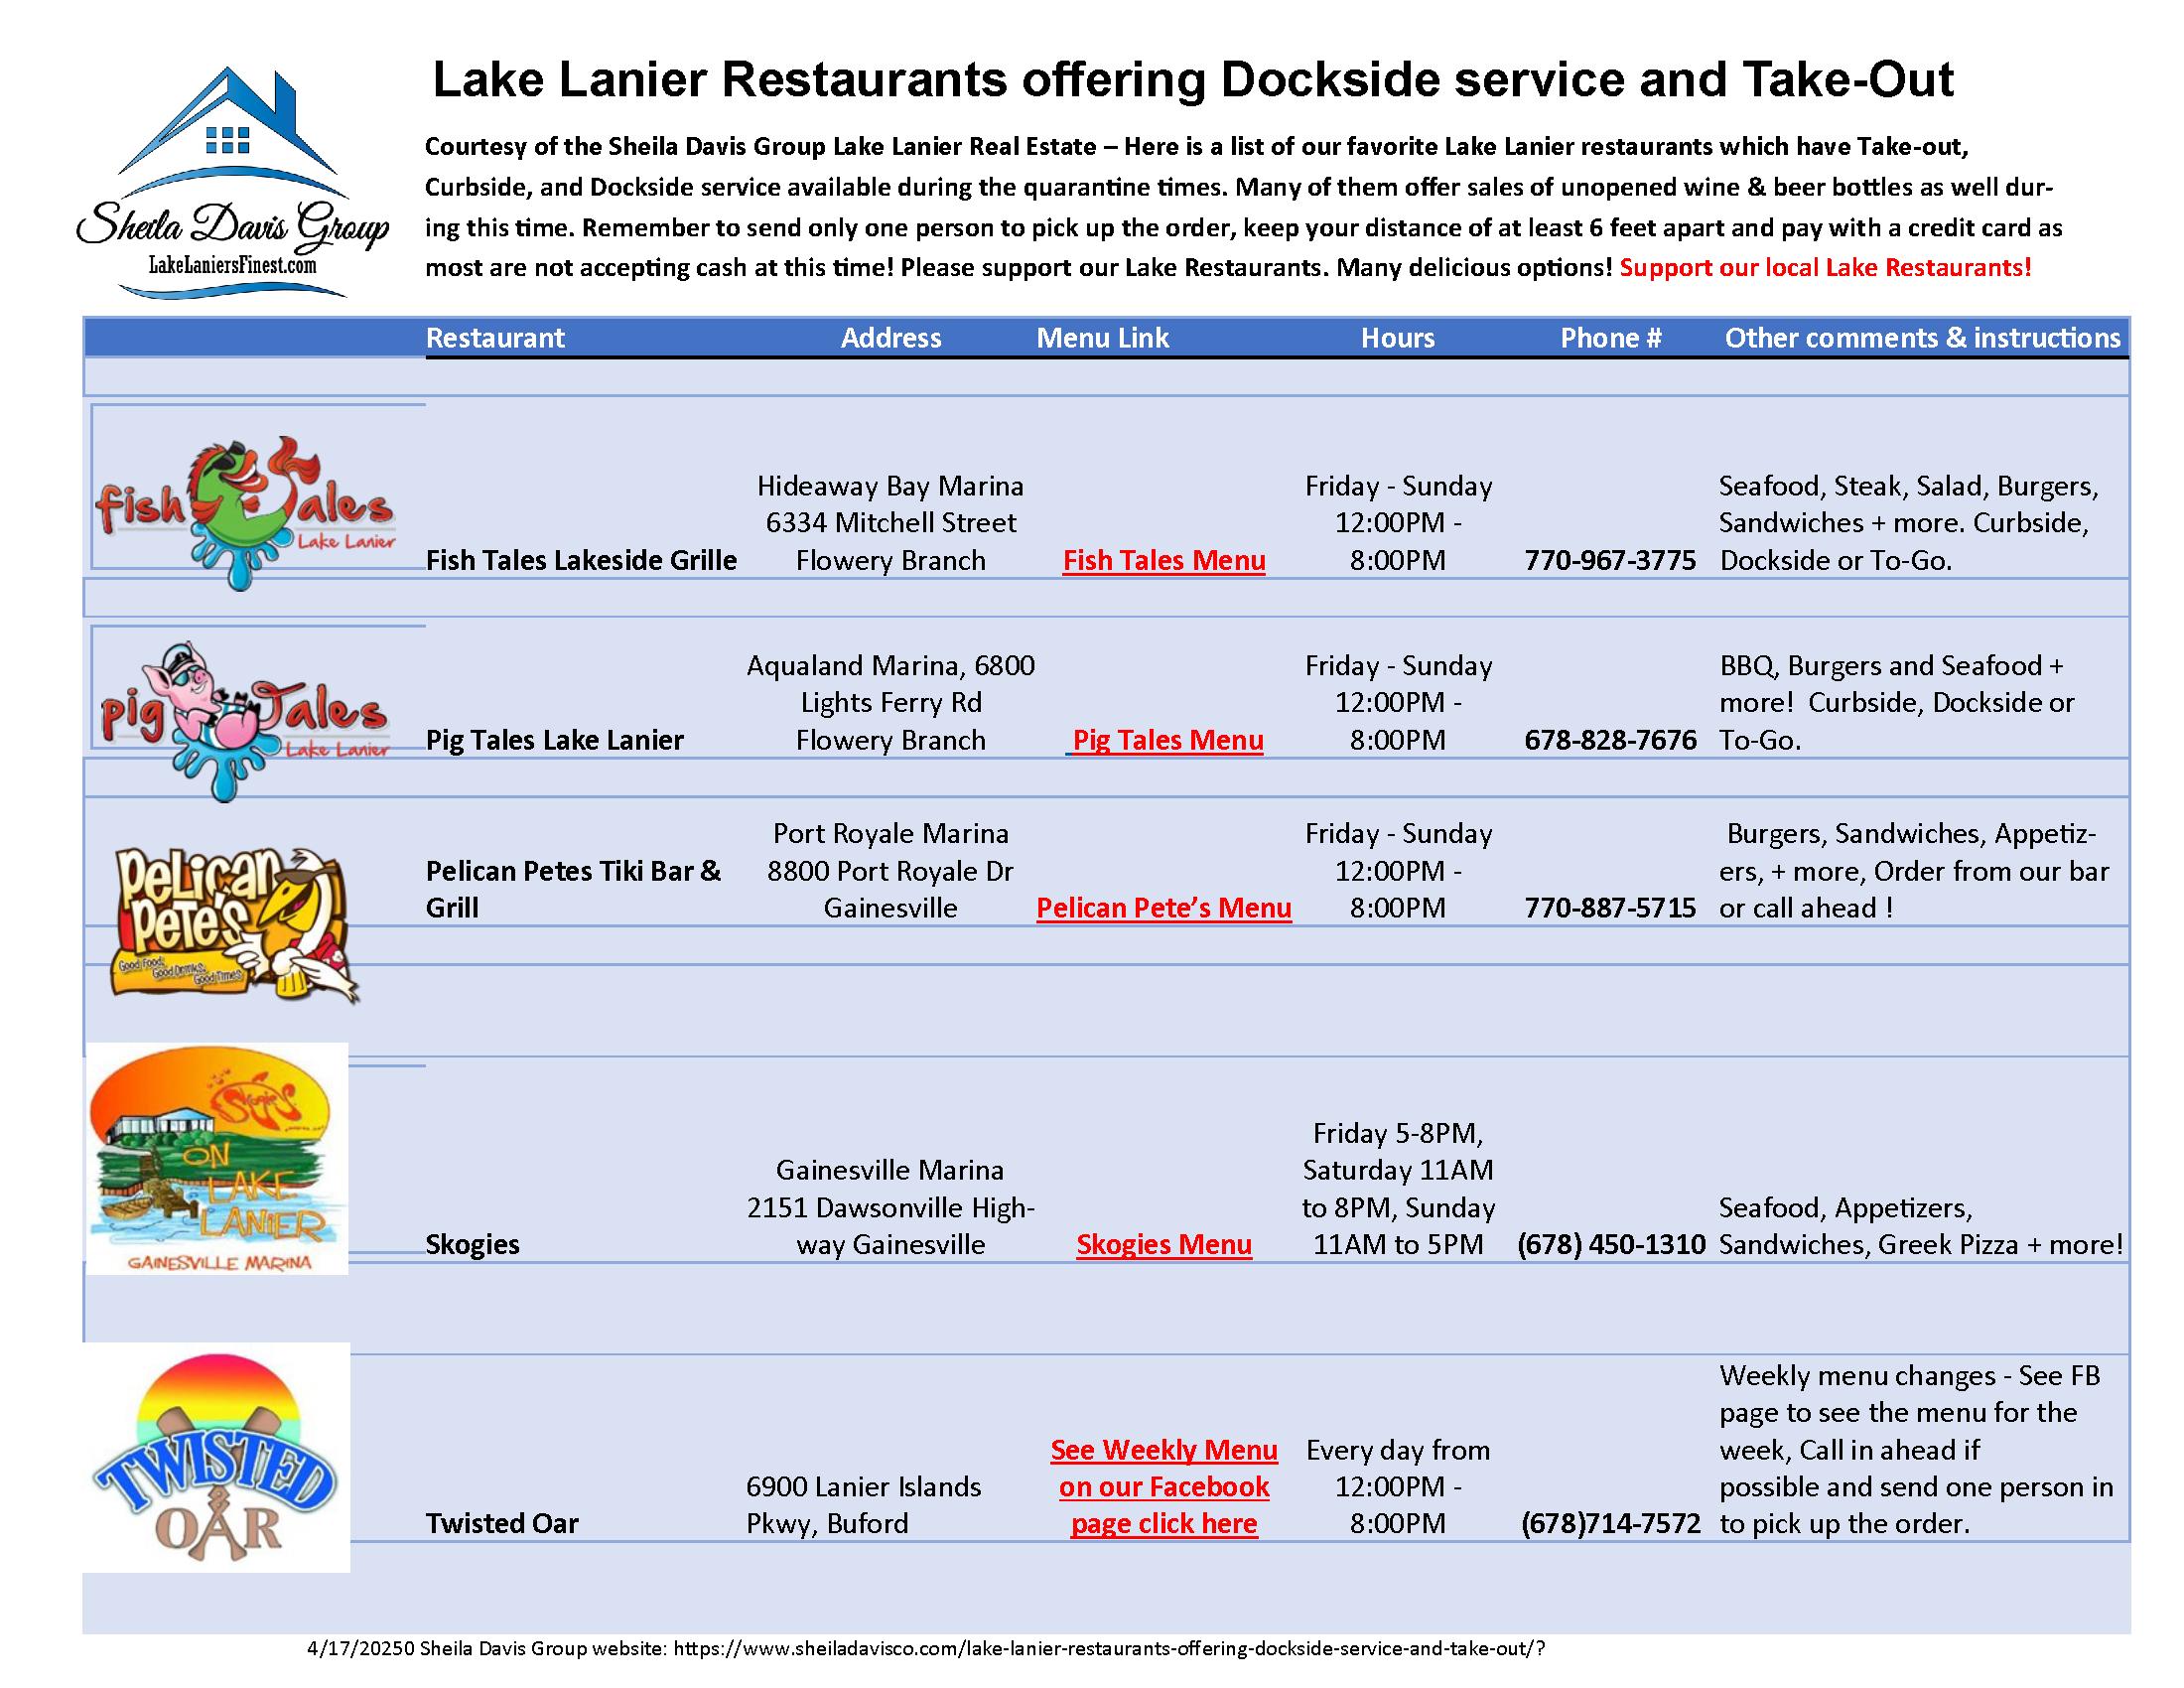 Sheila Davis Real Estate Lake Lanier Restaurants